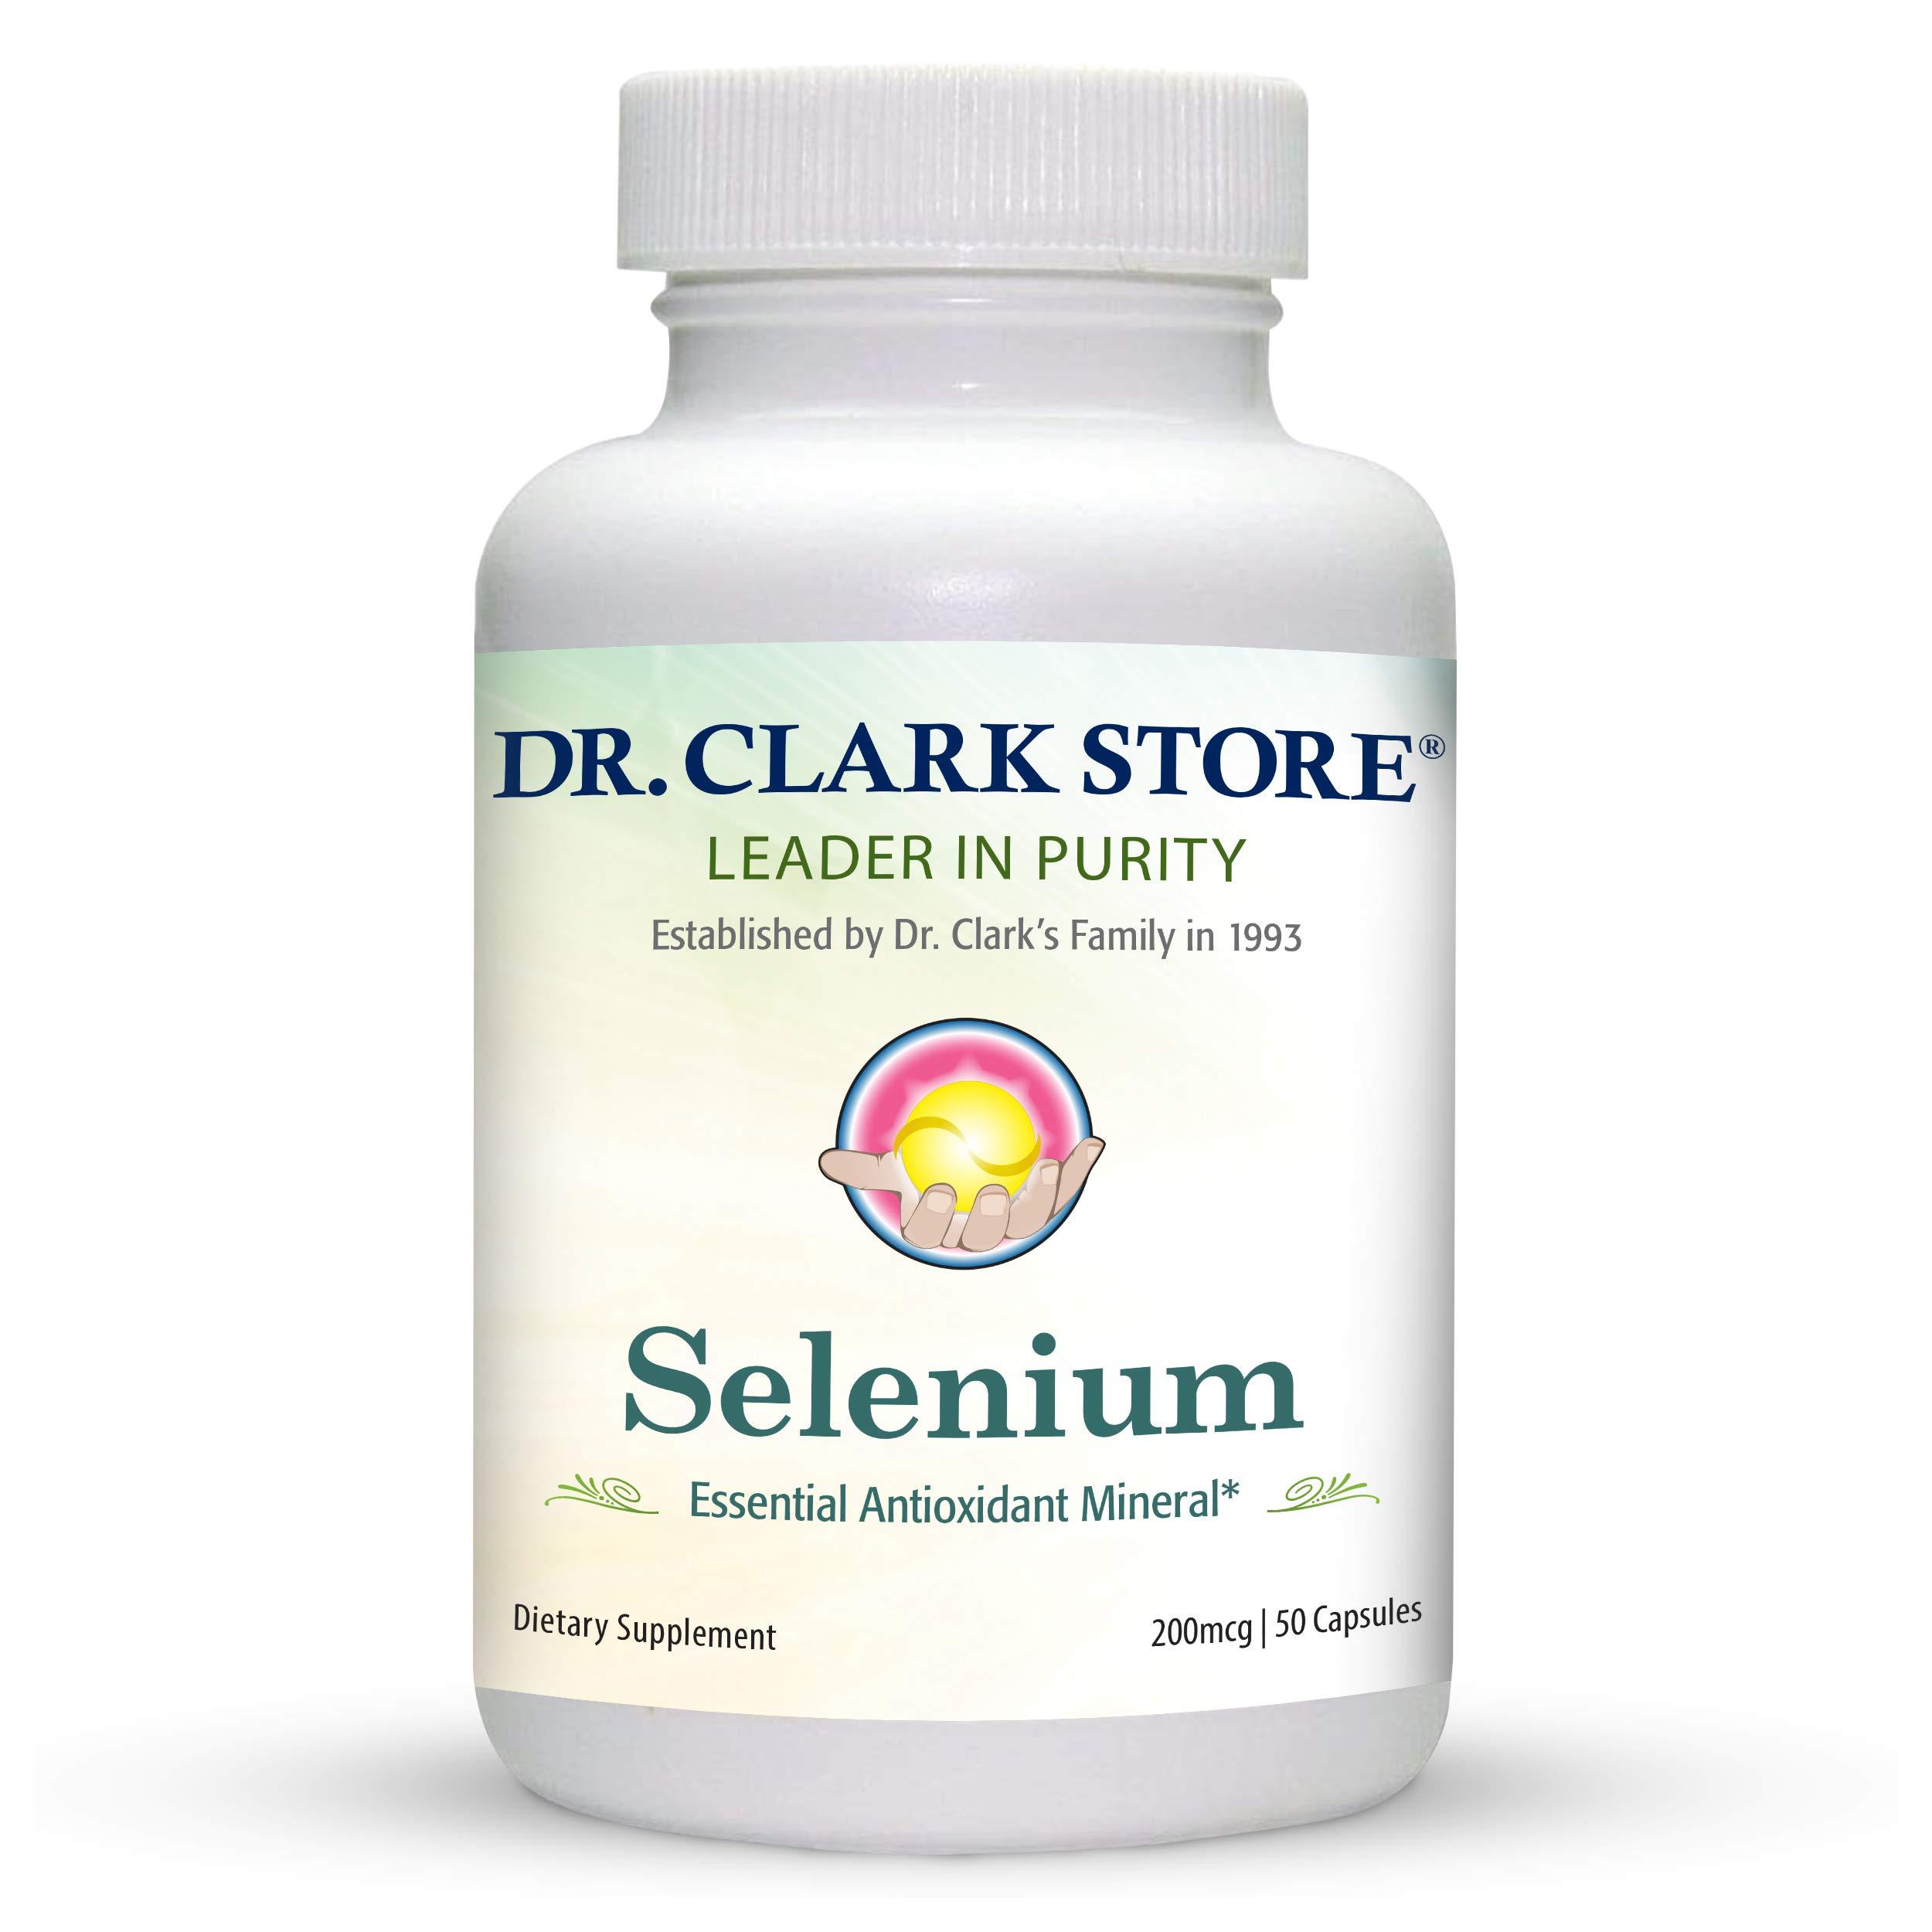 Dr. Clark Selenium Supplement 200 Mcg - Dietary Capsules with Essential Antioxidant Mineral - Improves Thyroid Function, Immune Support - 50 Capsules